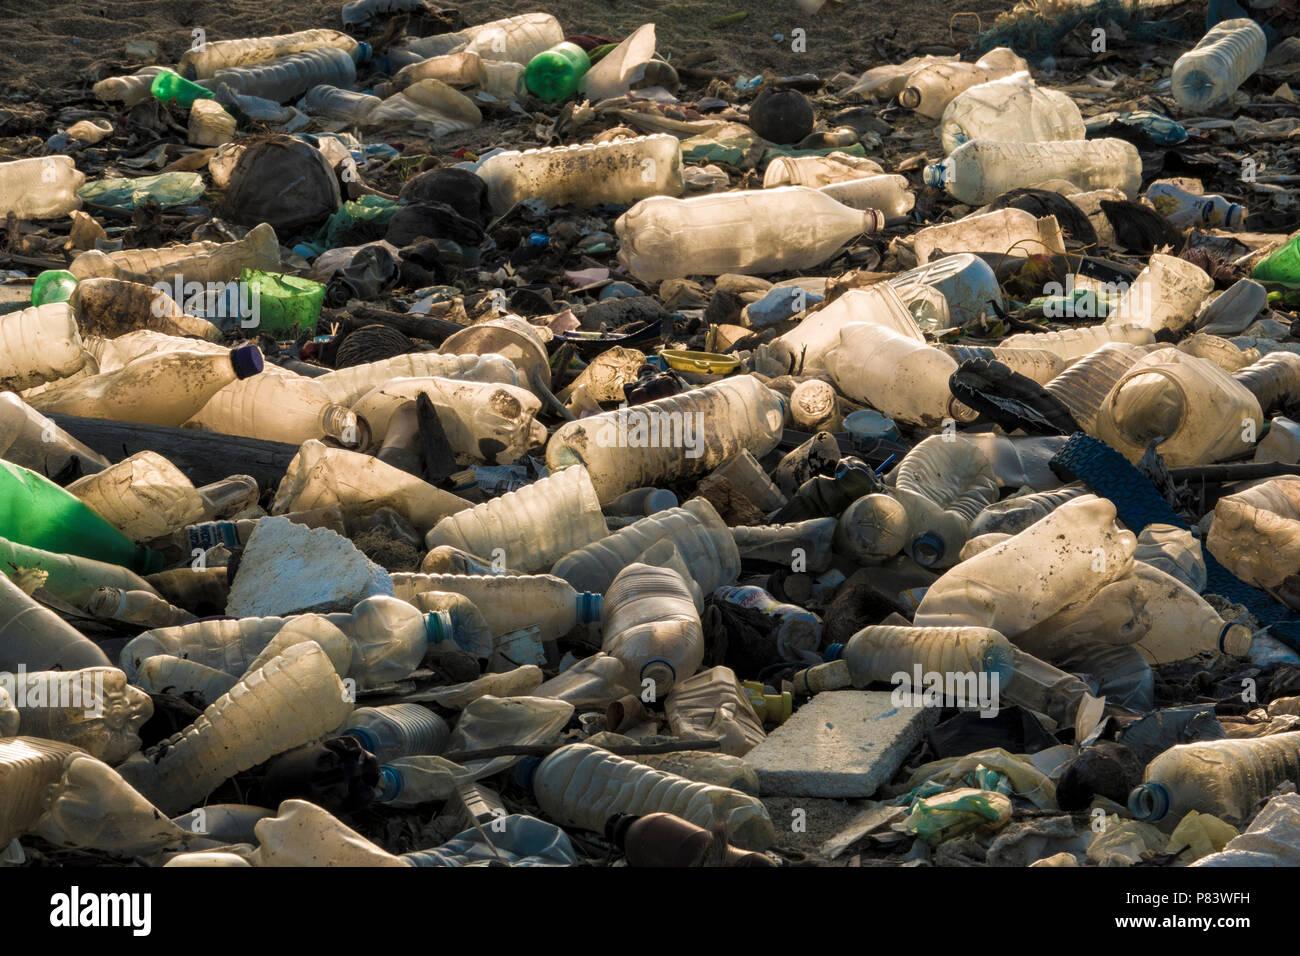 Empty single use plastic drink bottles and other trash on beach in Negombo, Sri Lanka - Stock Image